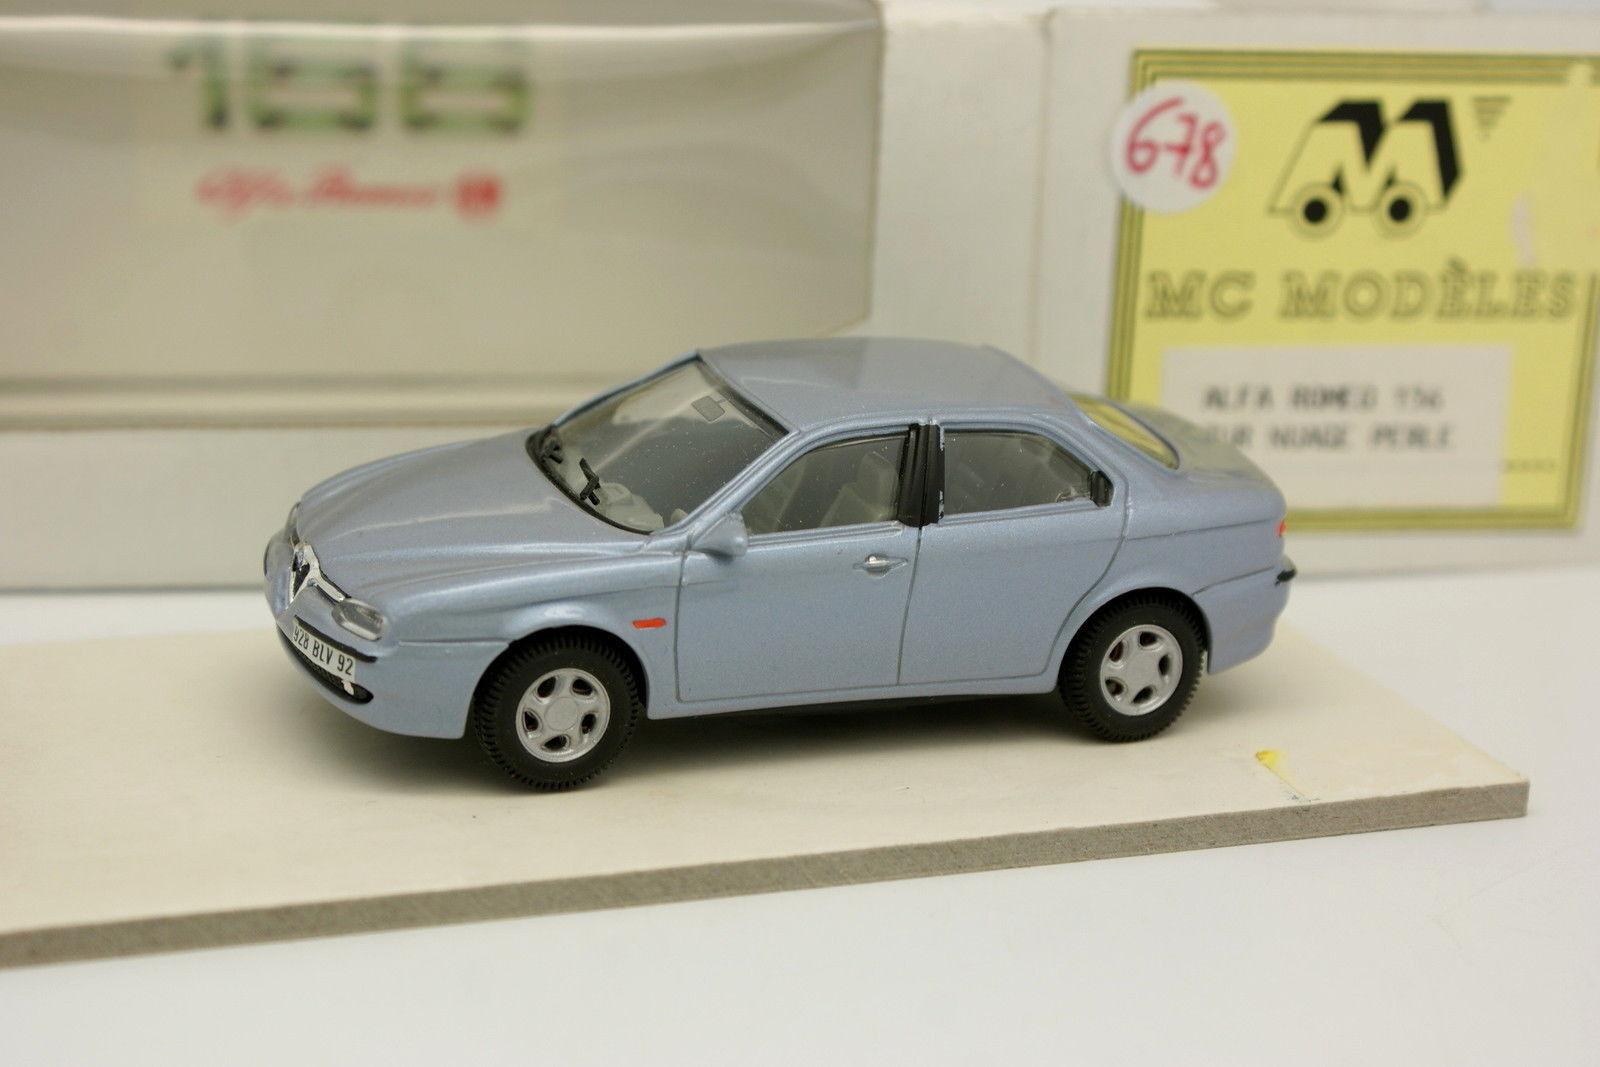 Mc Modelos Resina 1 43 - Alfa Romeo 156 Azul